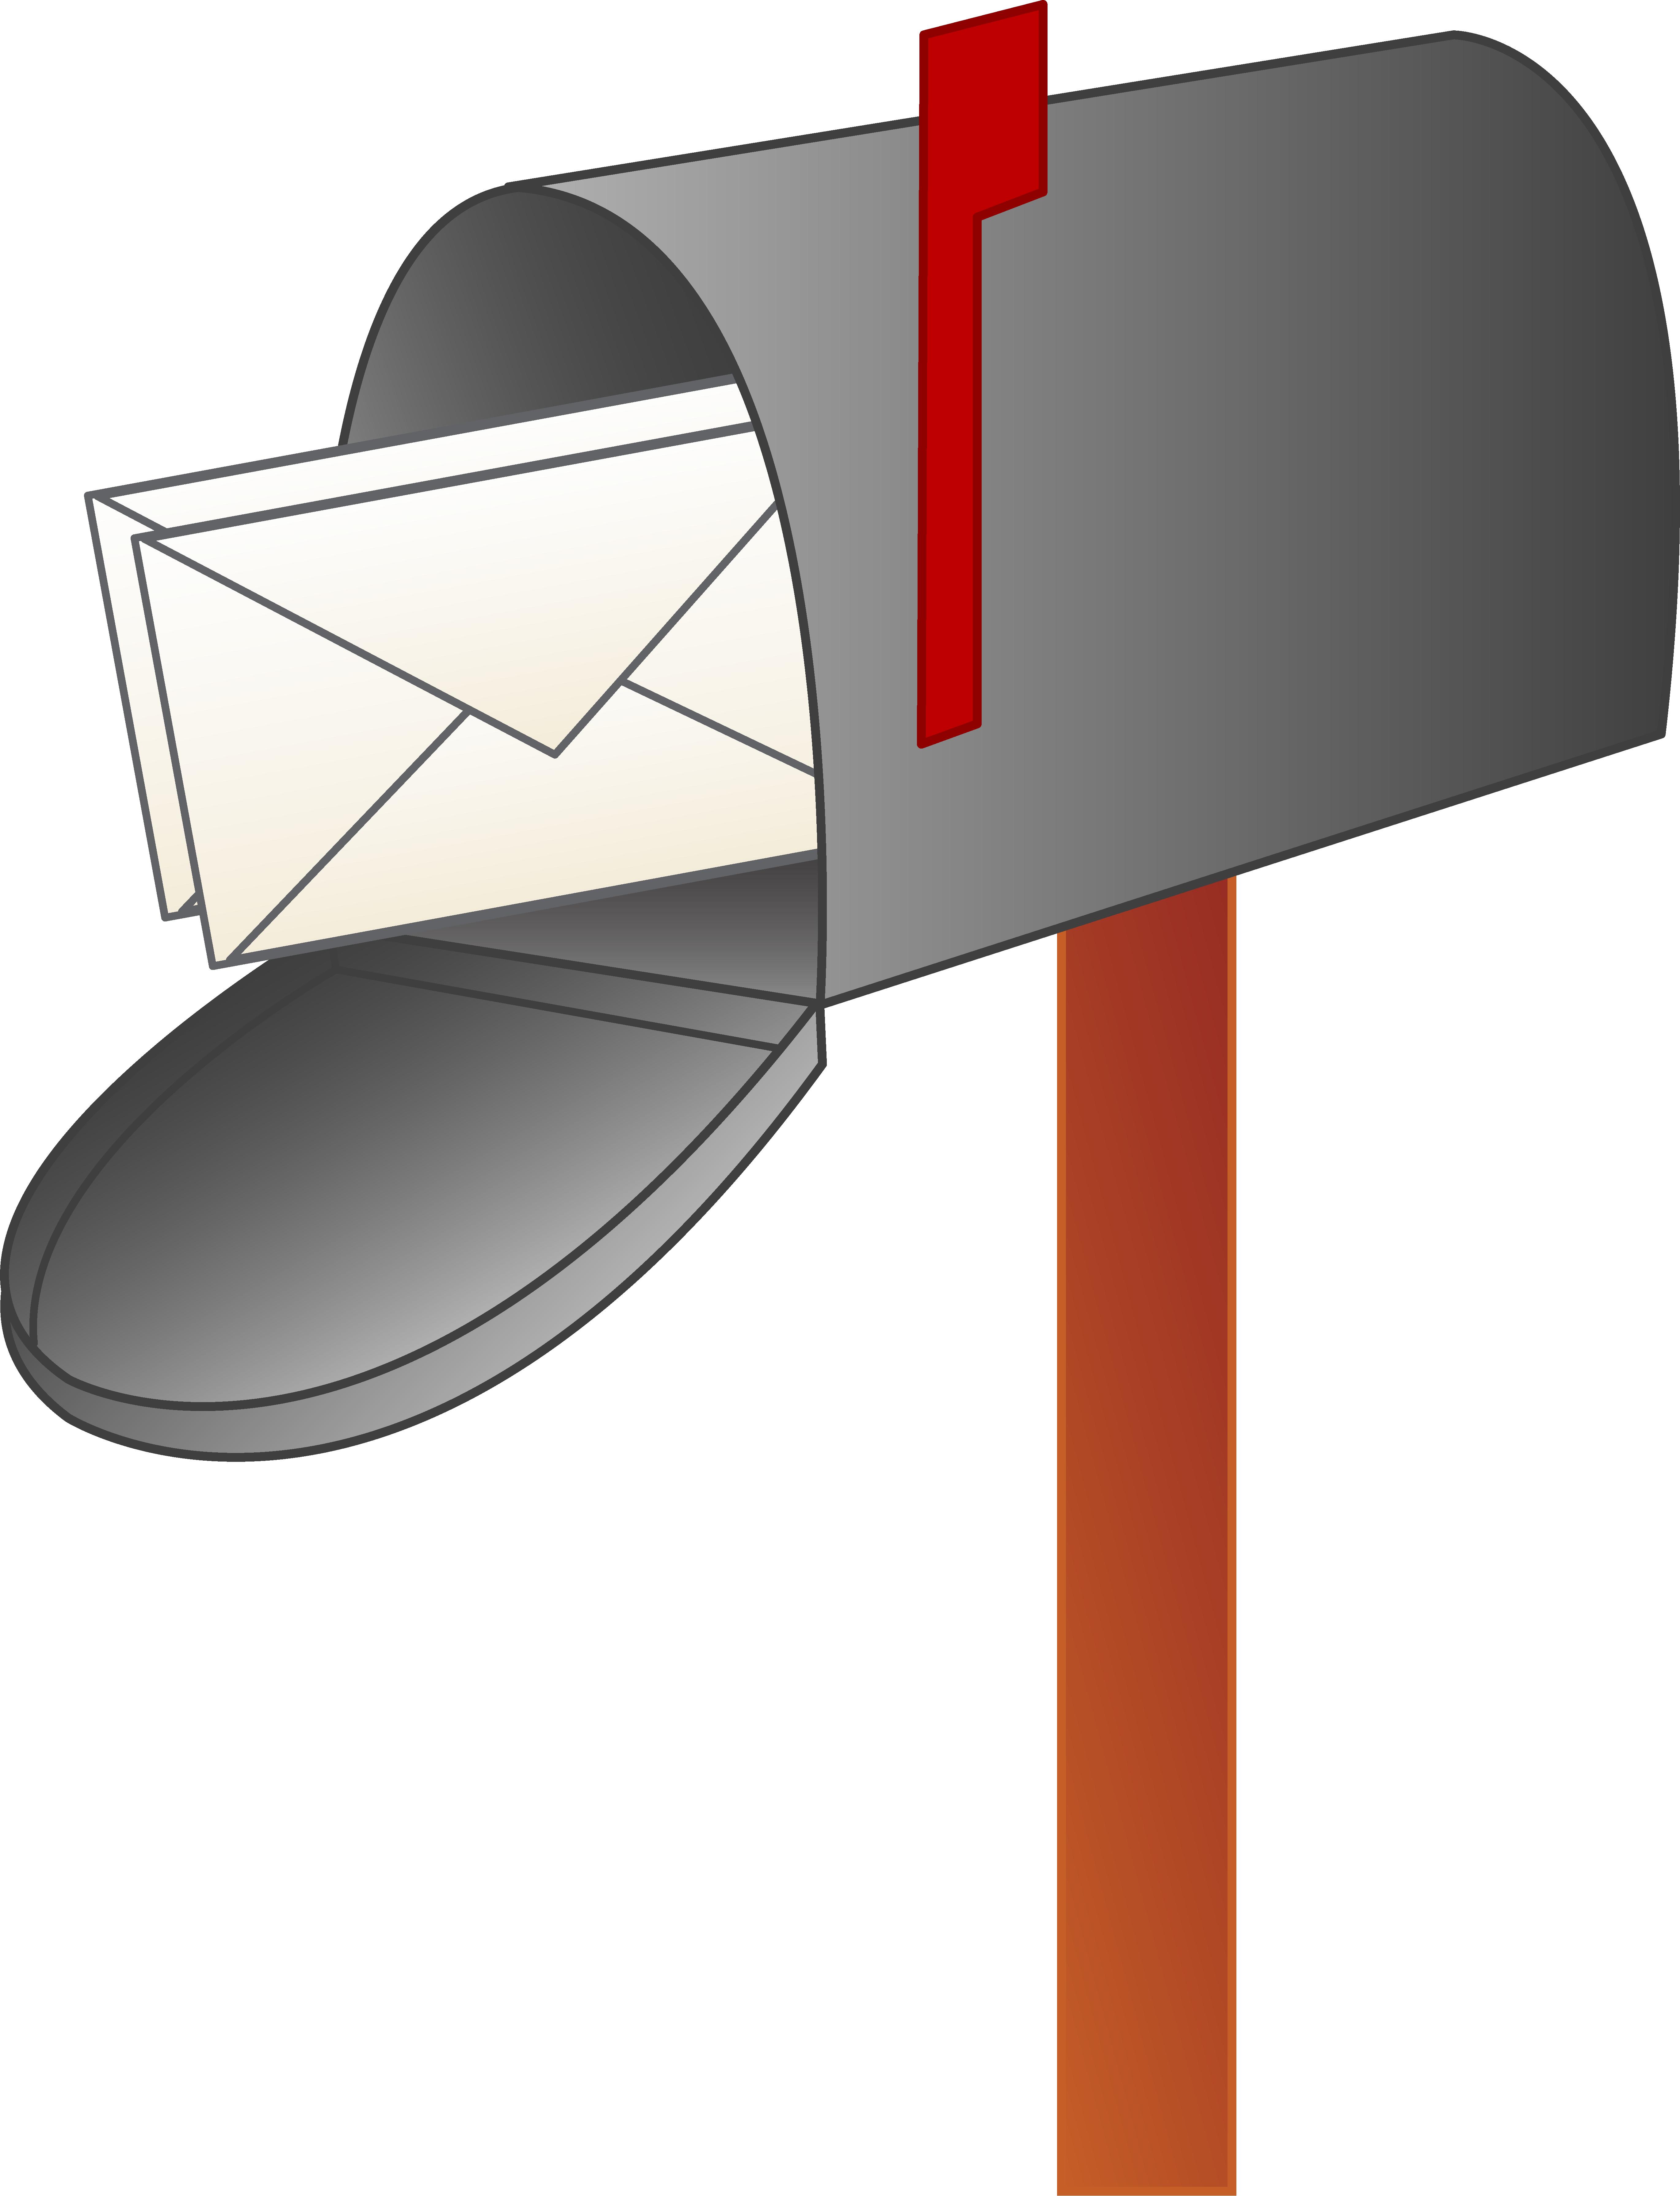 Cartoon Mailbox Clipart-Cartoon Mailbox Clipart-6